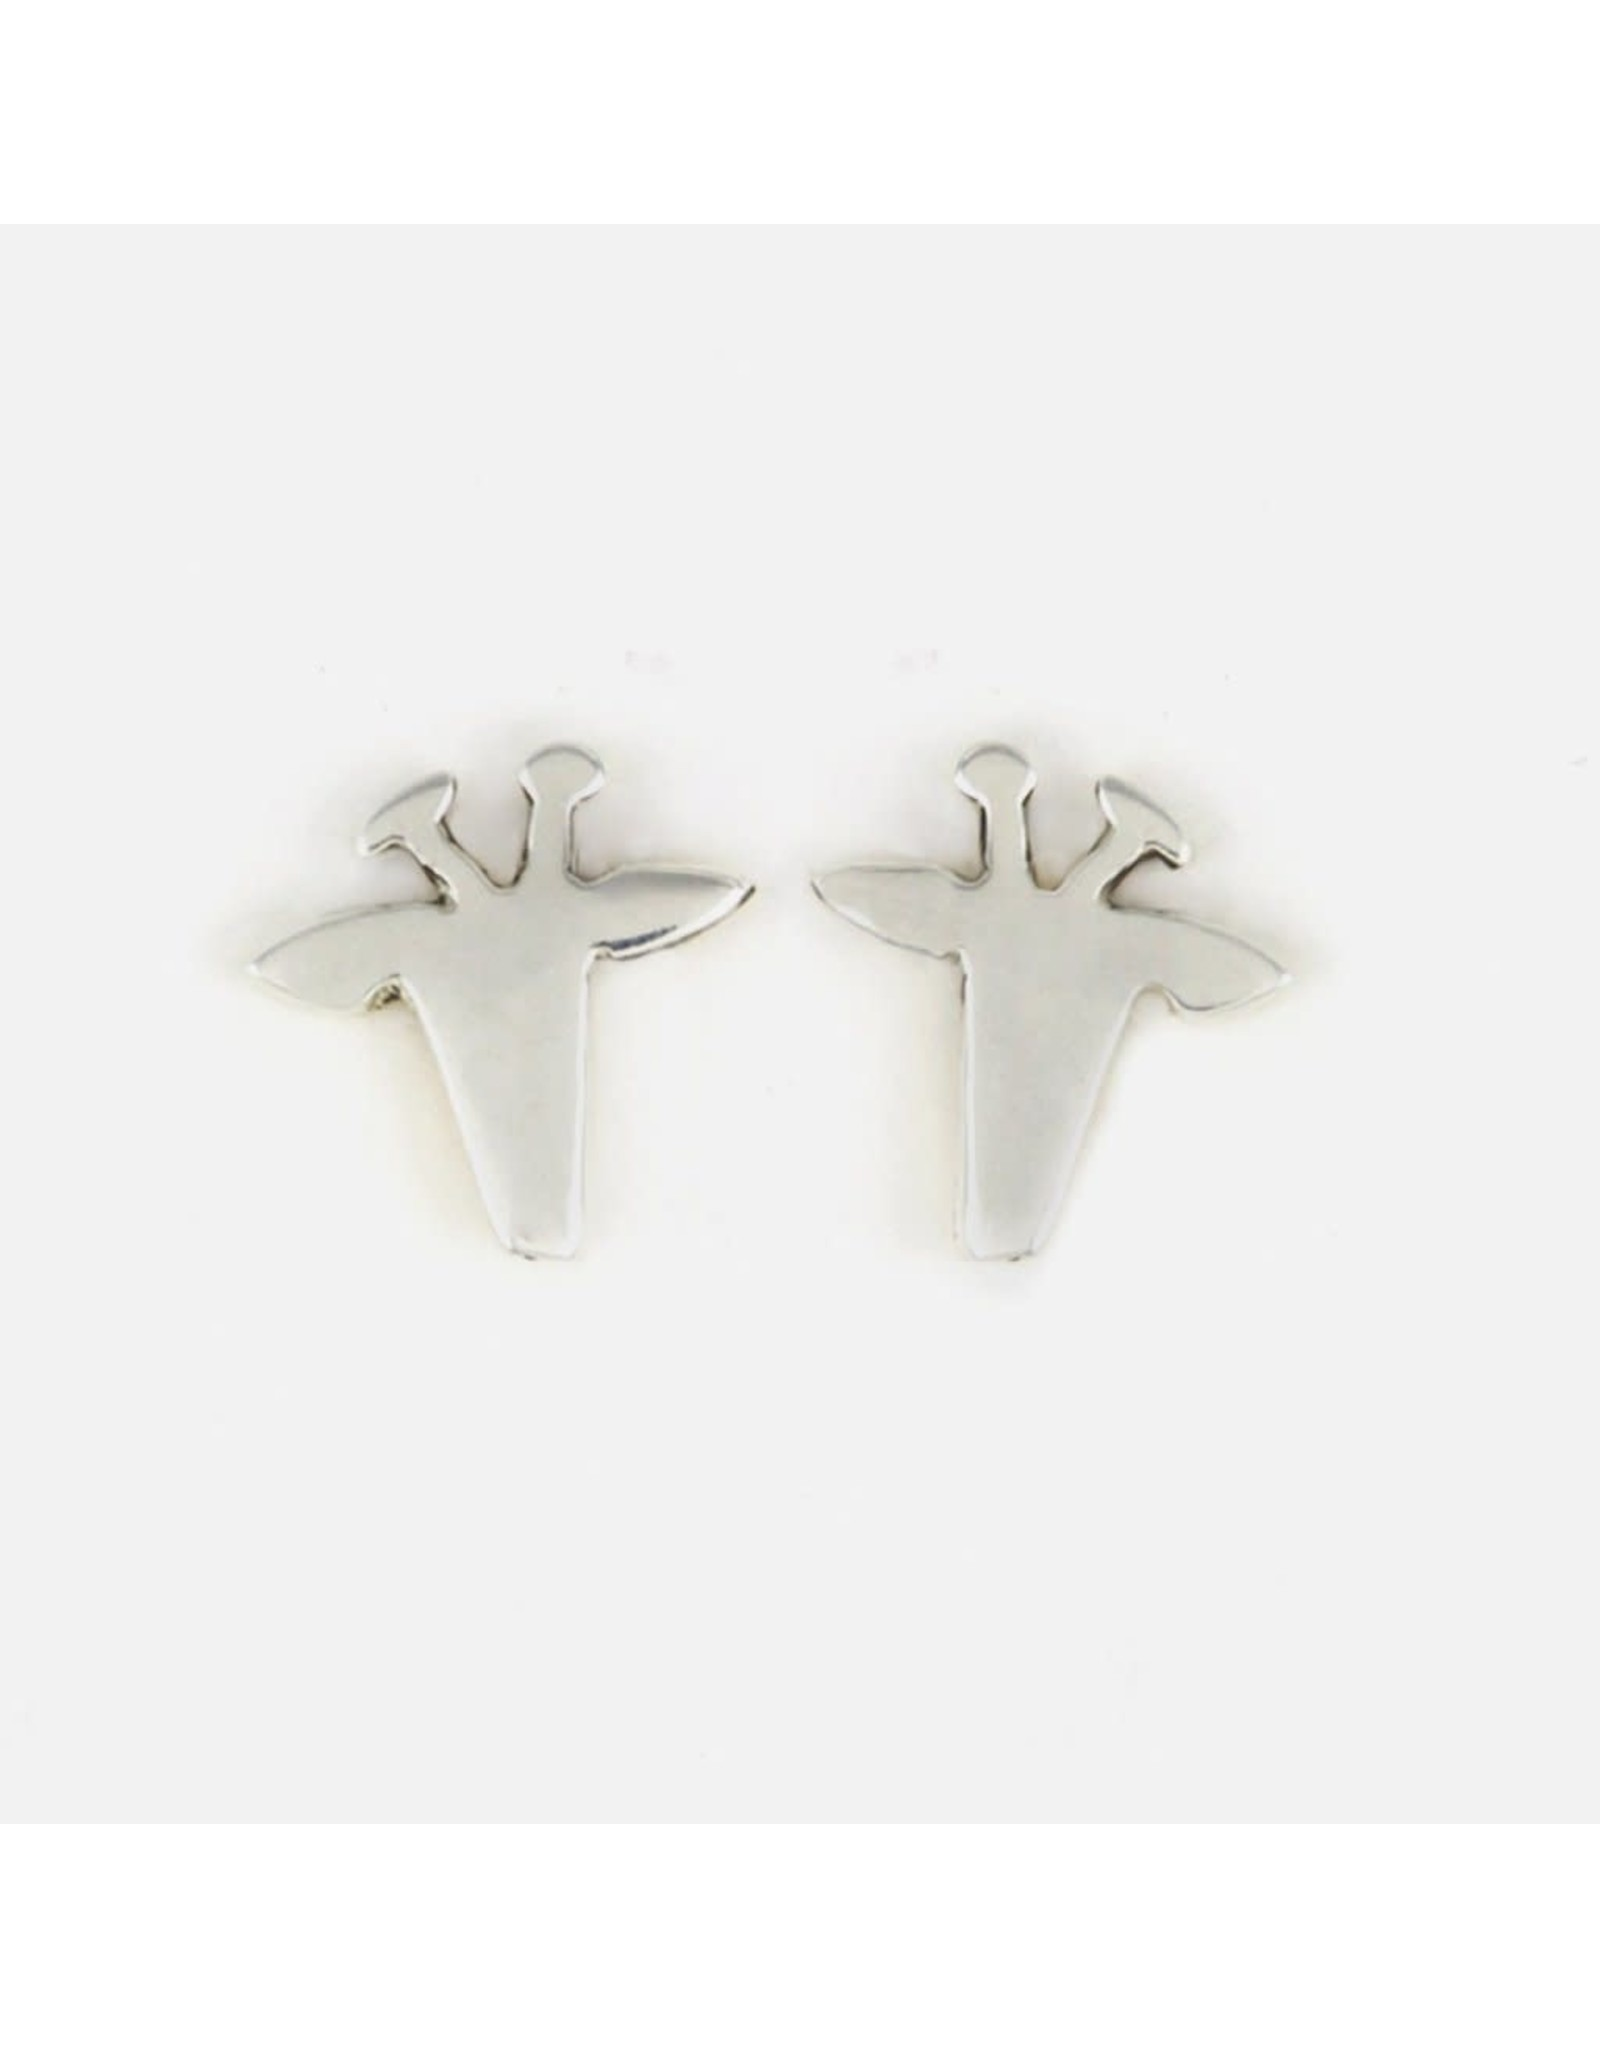 Giraffe Sterling Post Earrings, Mexico